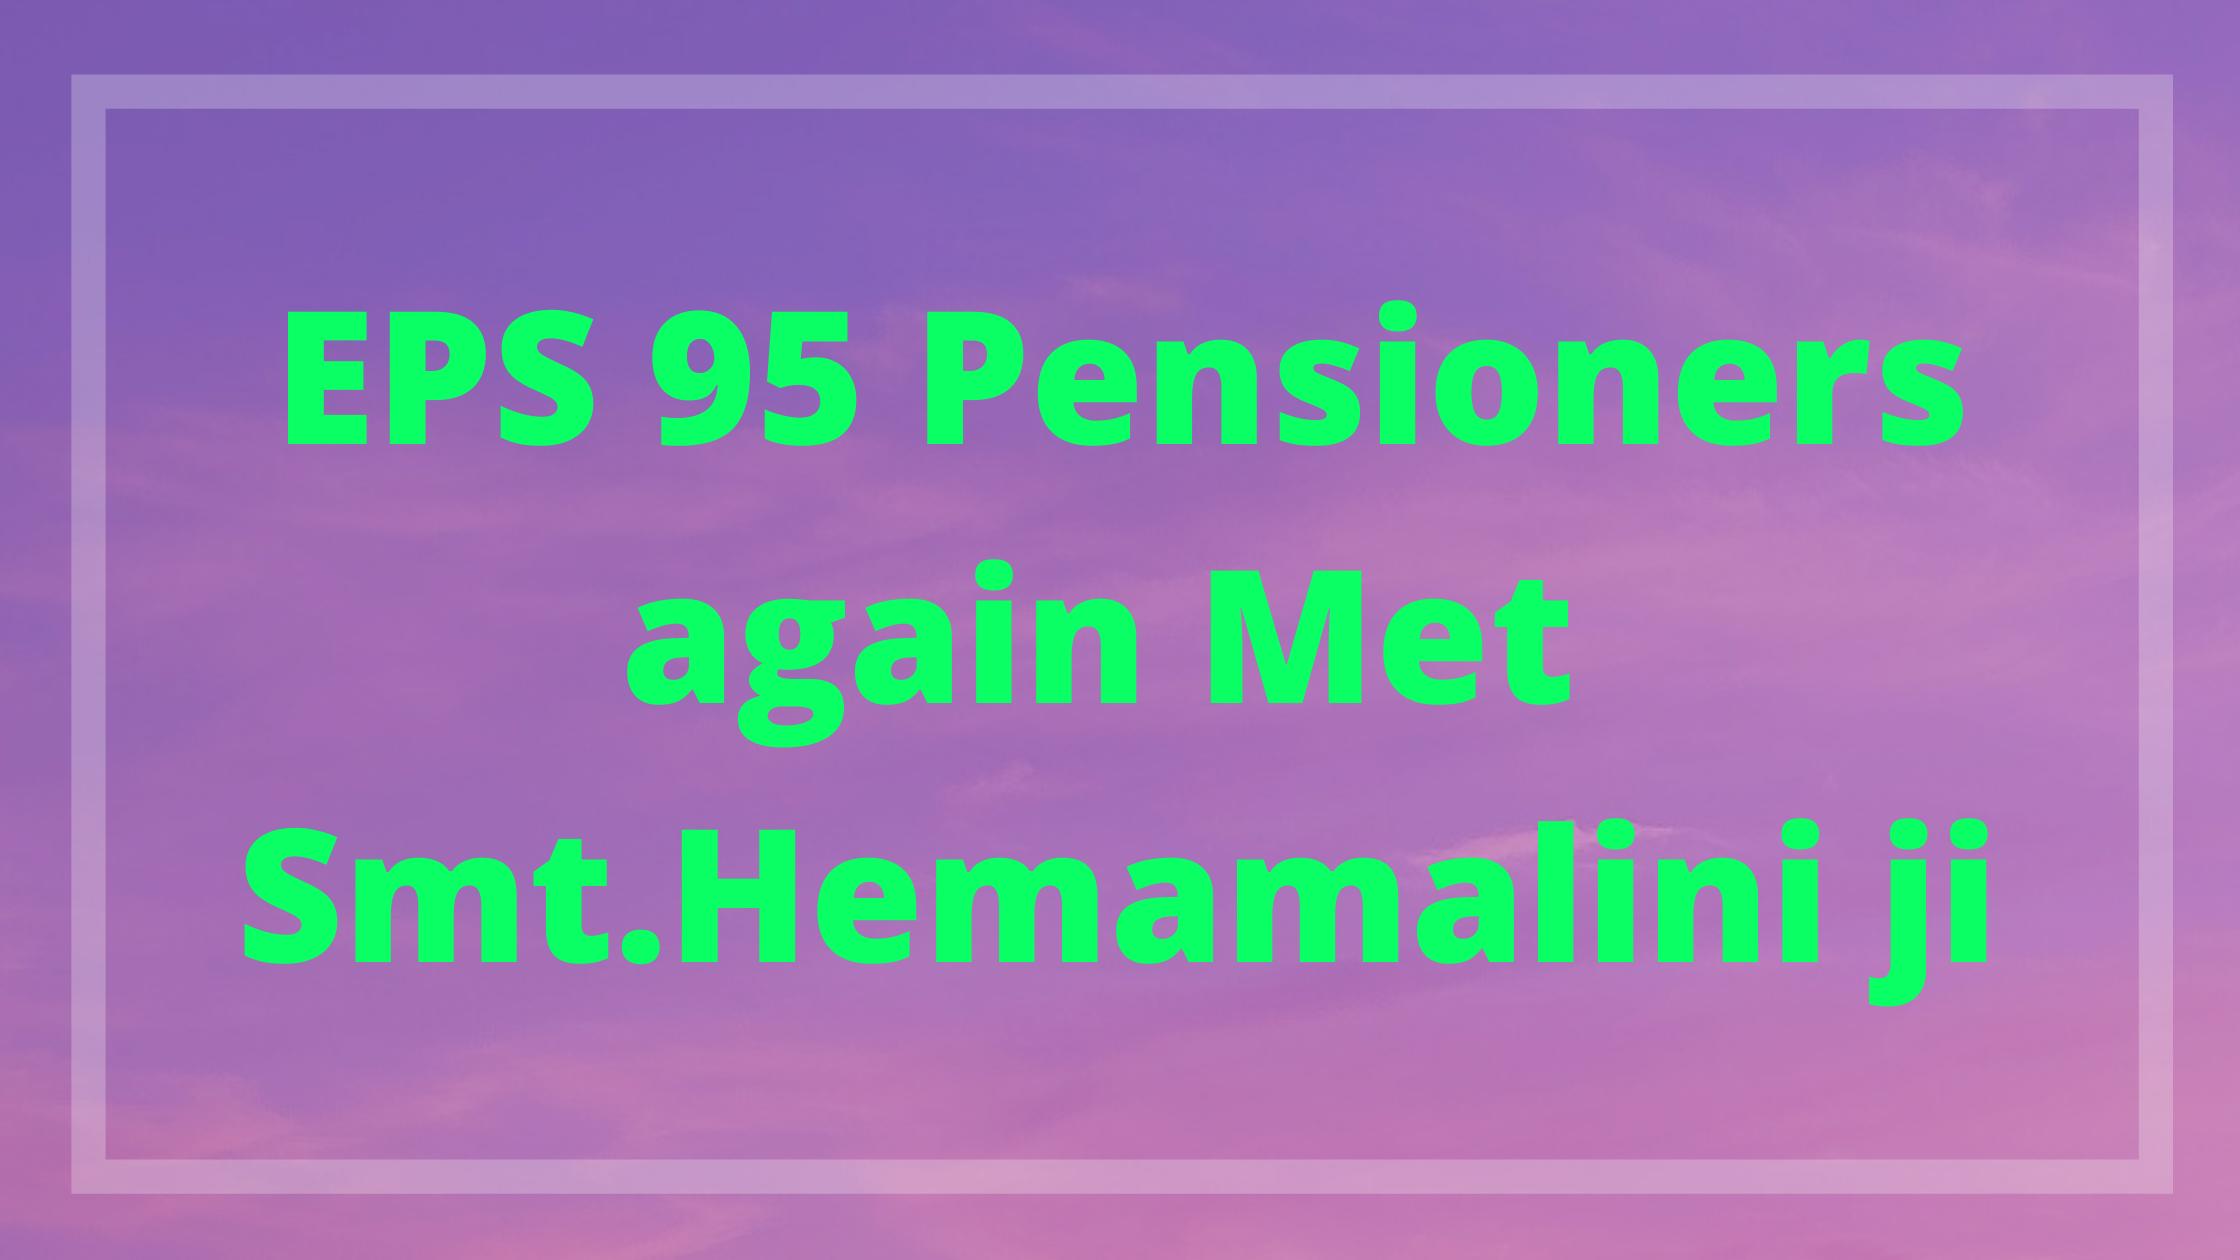 Eps 95 Pensioners met Smt Hemamalini ji again